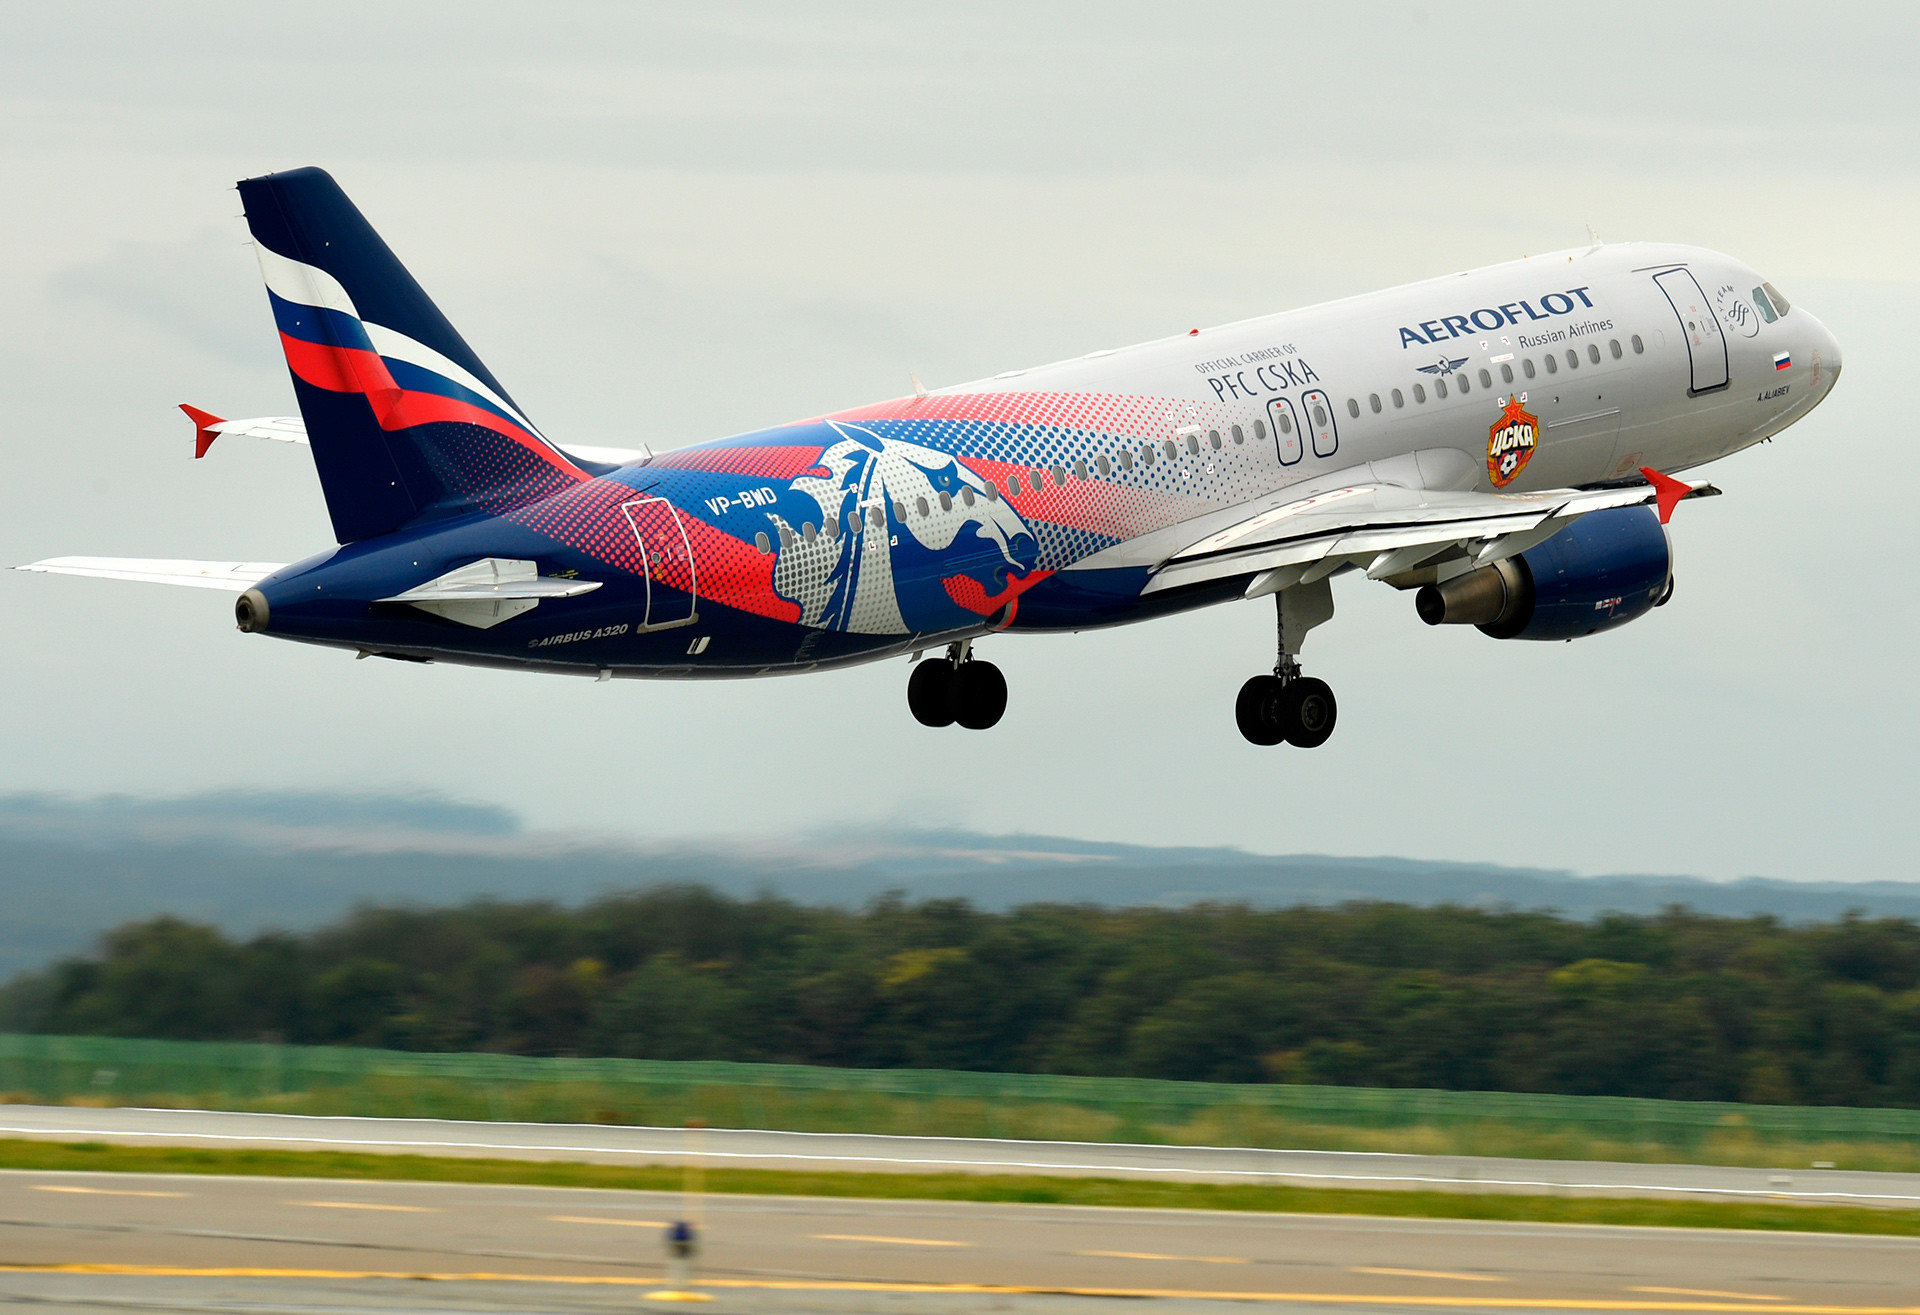 Pesawat Airbus-A320 milik Aeroflot lepas landas di Bandara Internasional Kazan.